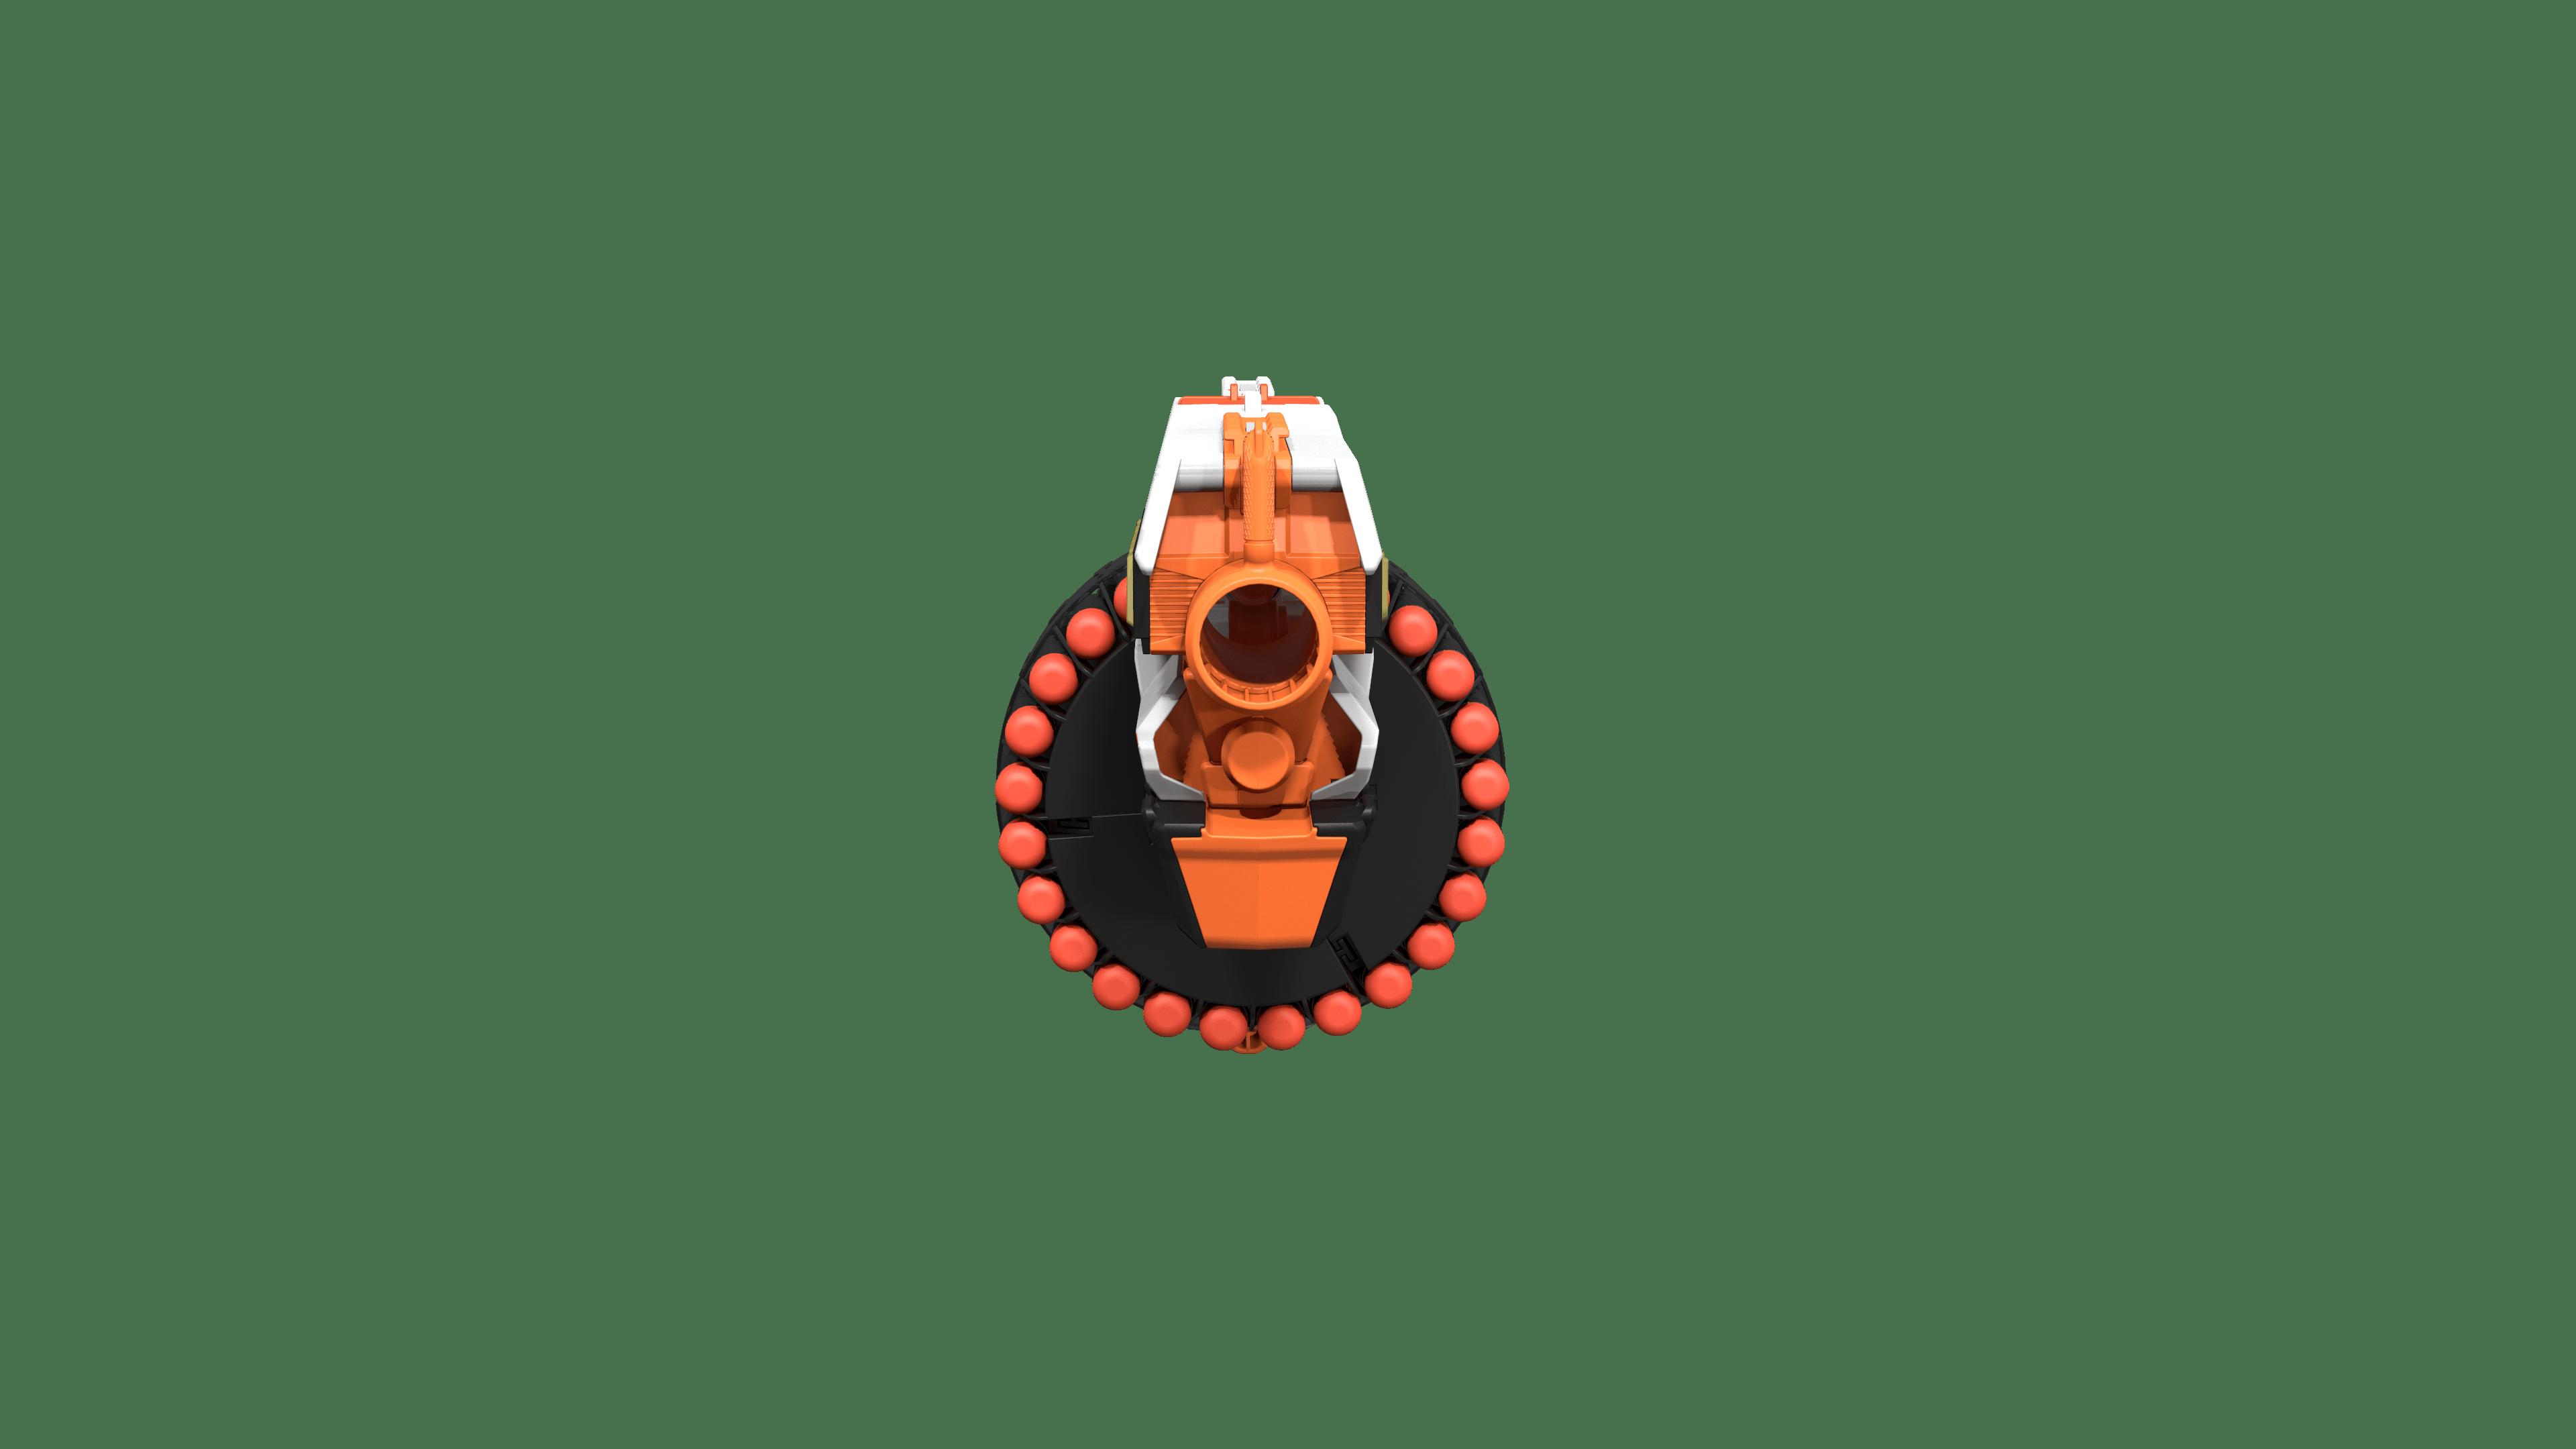 ultra blaster img 92